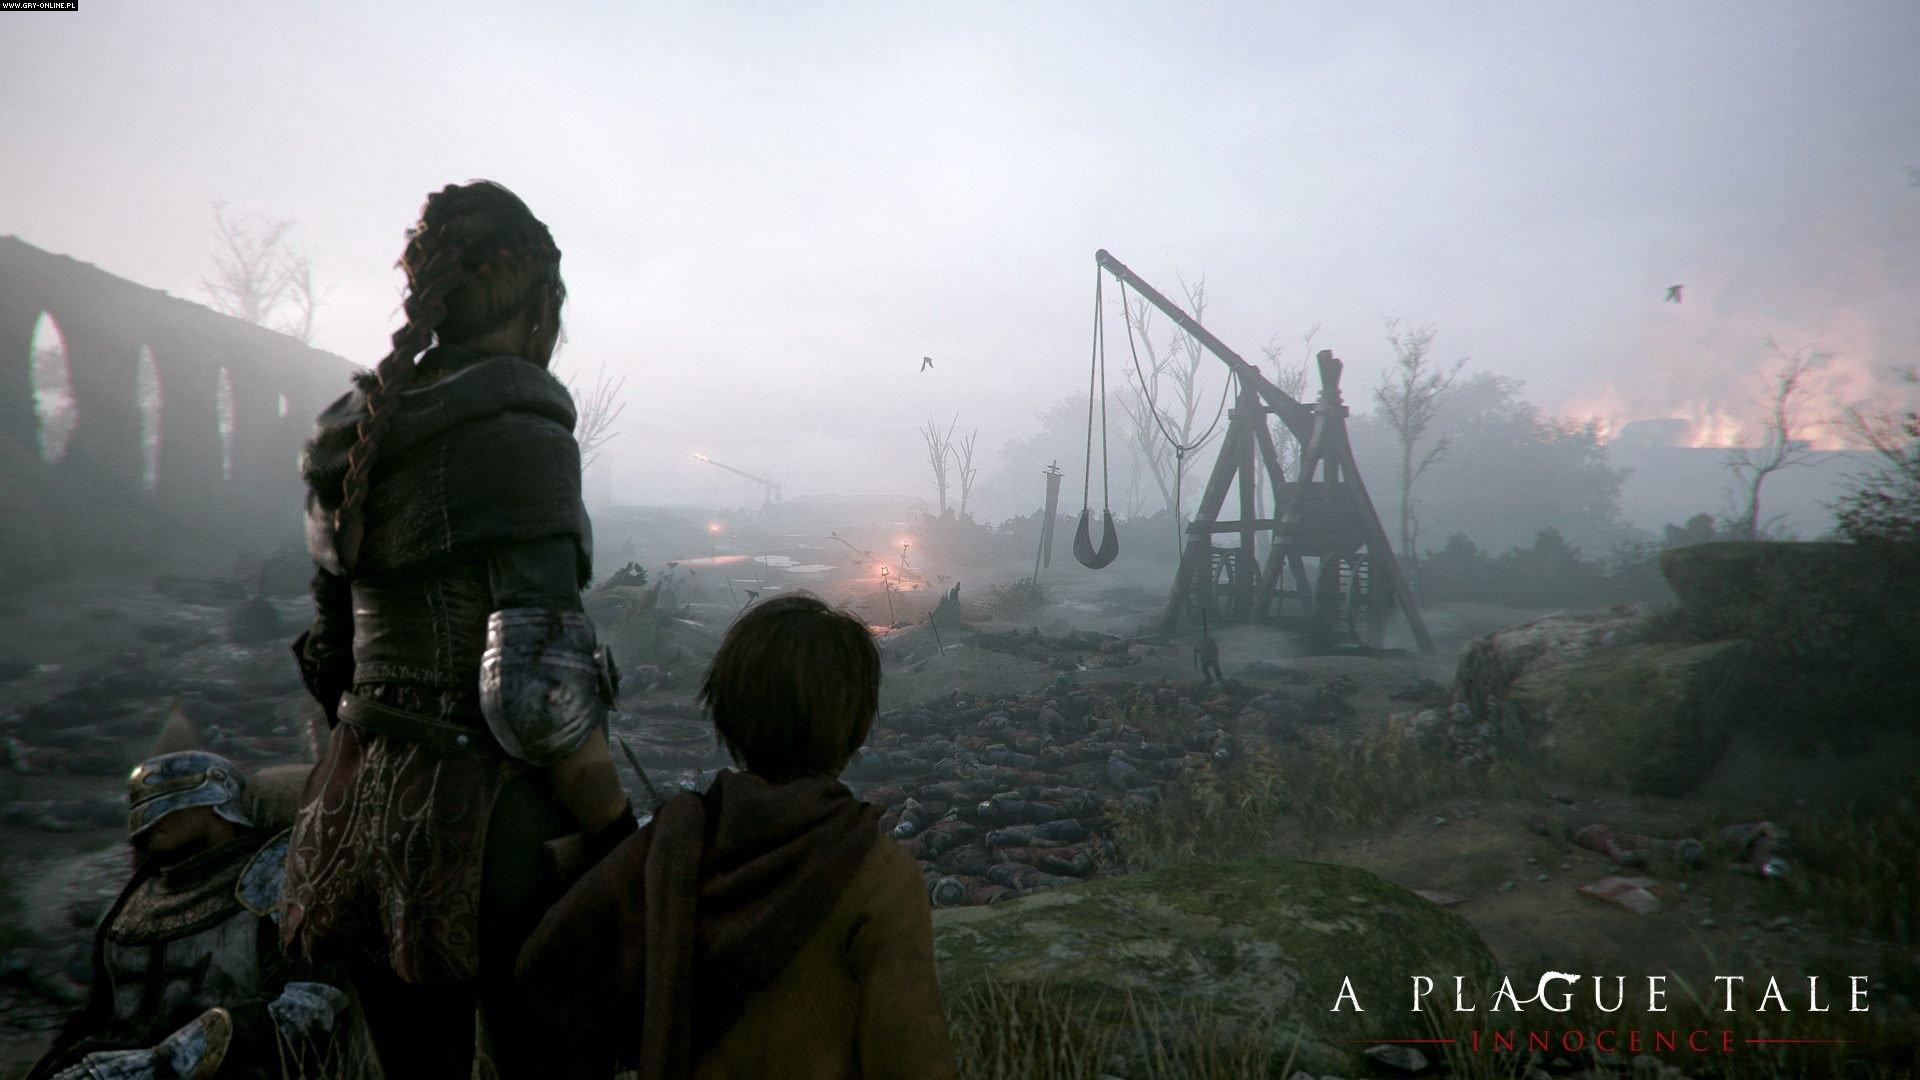 A Plague Tale: Innocence PC, PS4, XONE Games Image 30/30, Asobo Studio, Focus Home Interactive